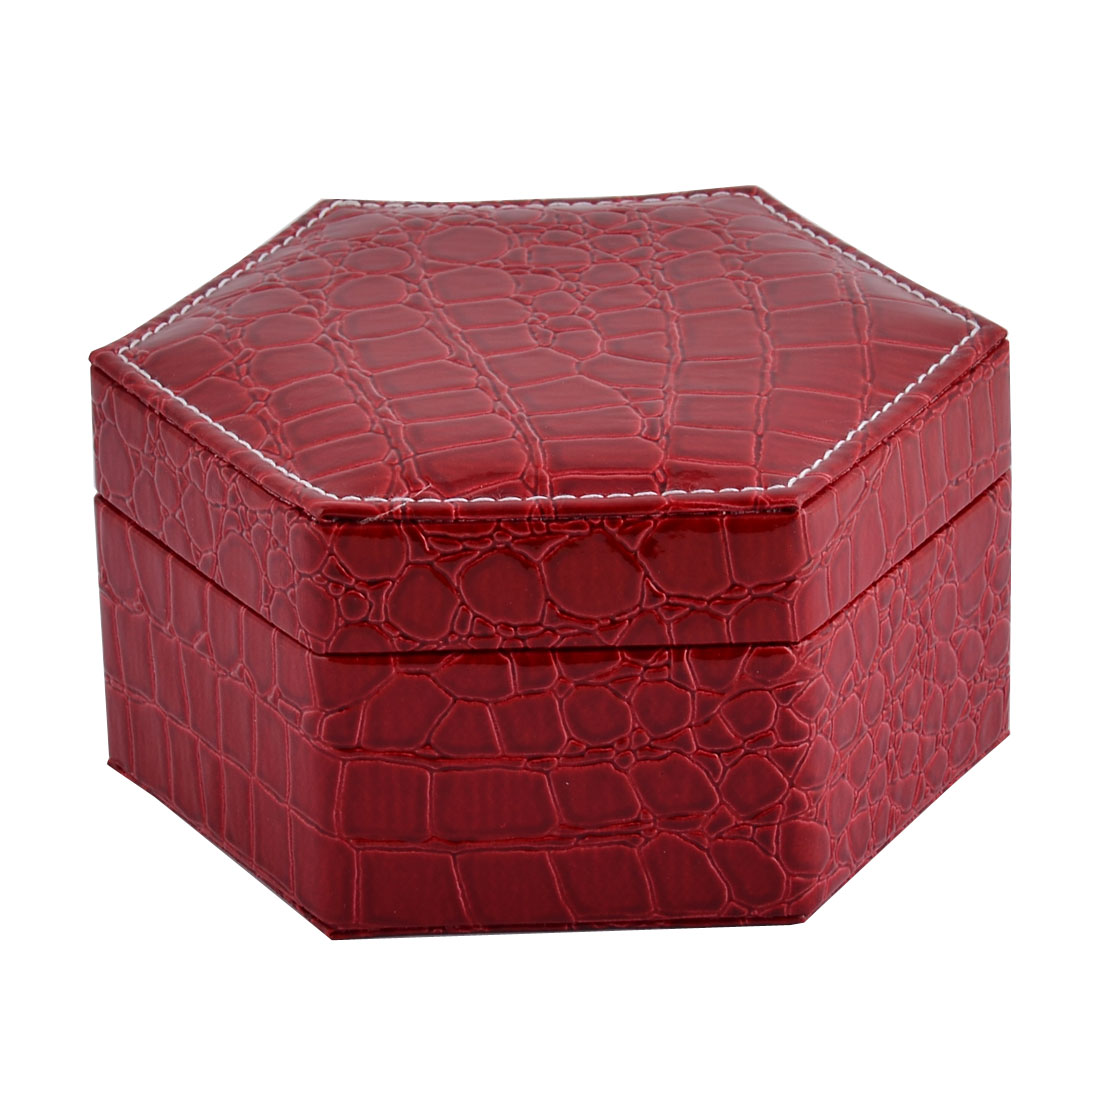 Home Travel Cosmetics Jewelry Bead Display Case Holder Storage Box Casket Red